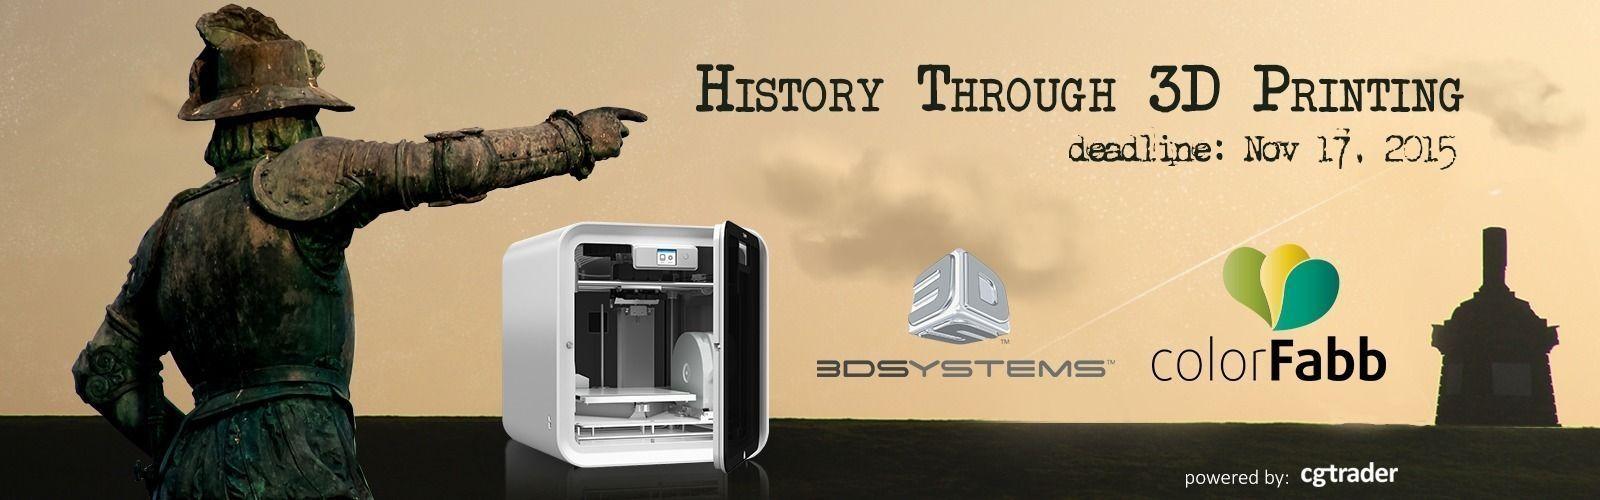 History Through 3D Printing